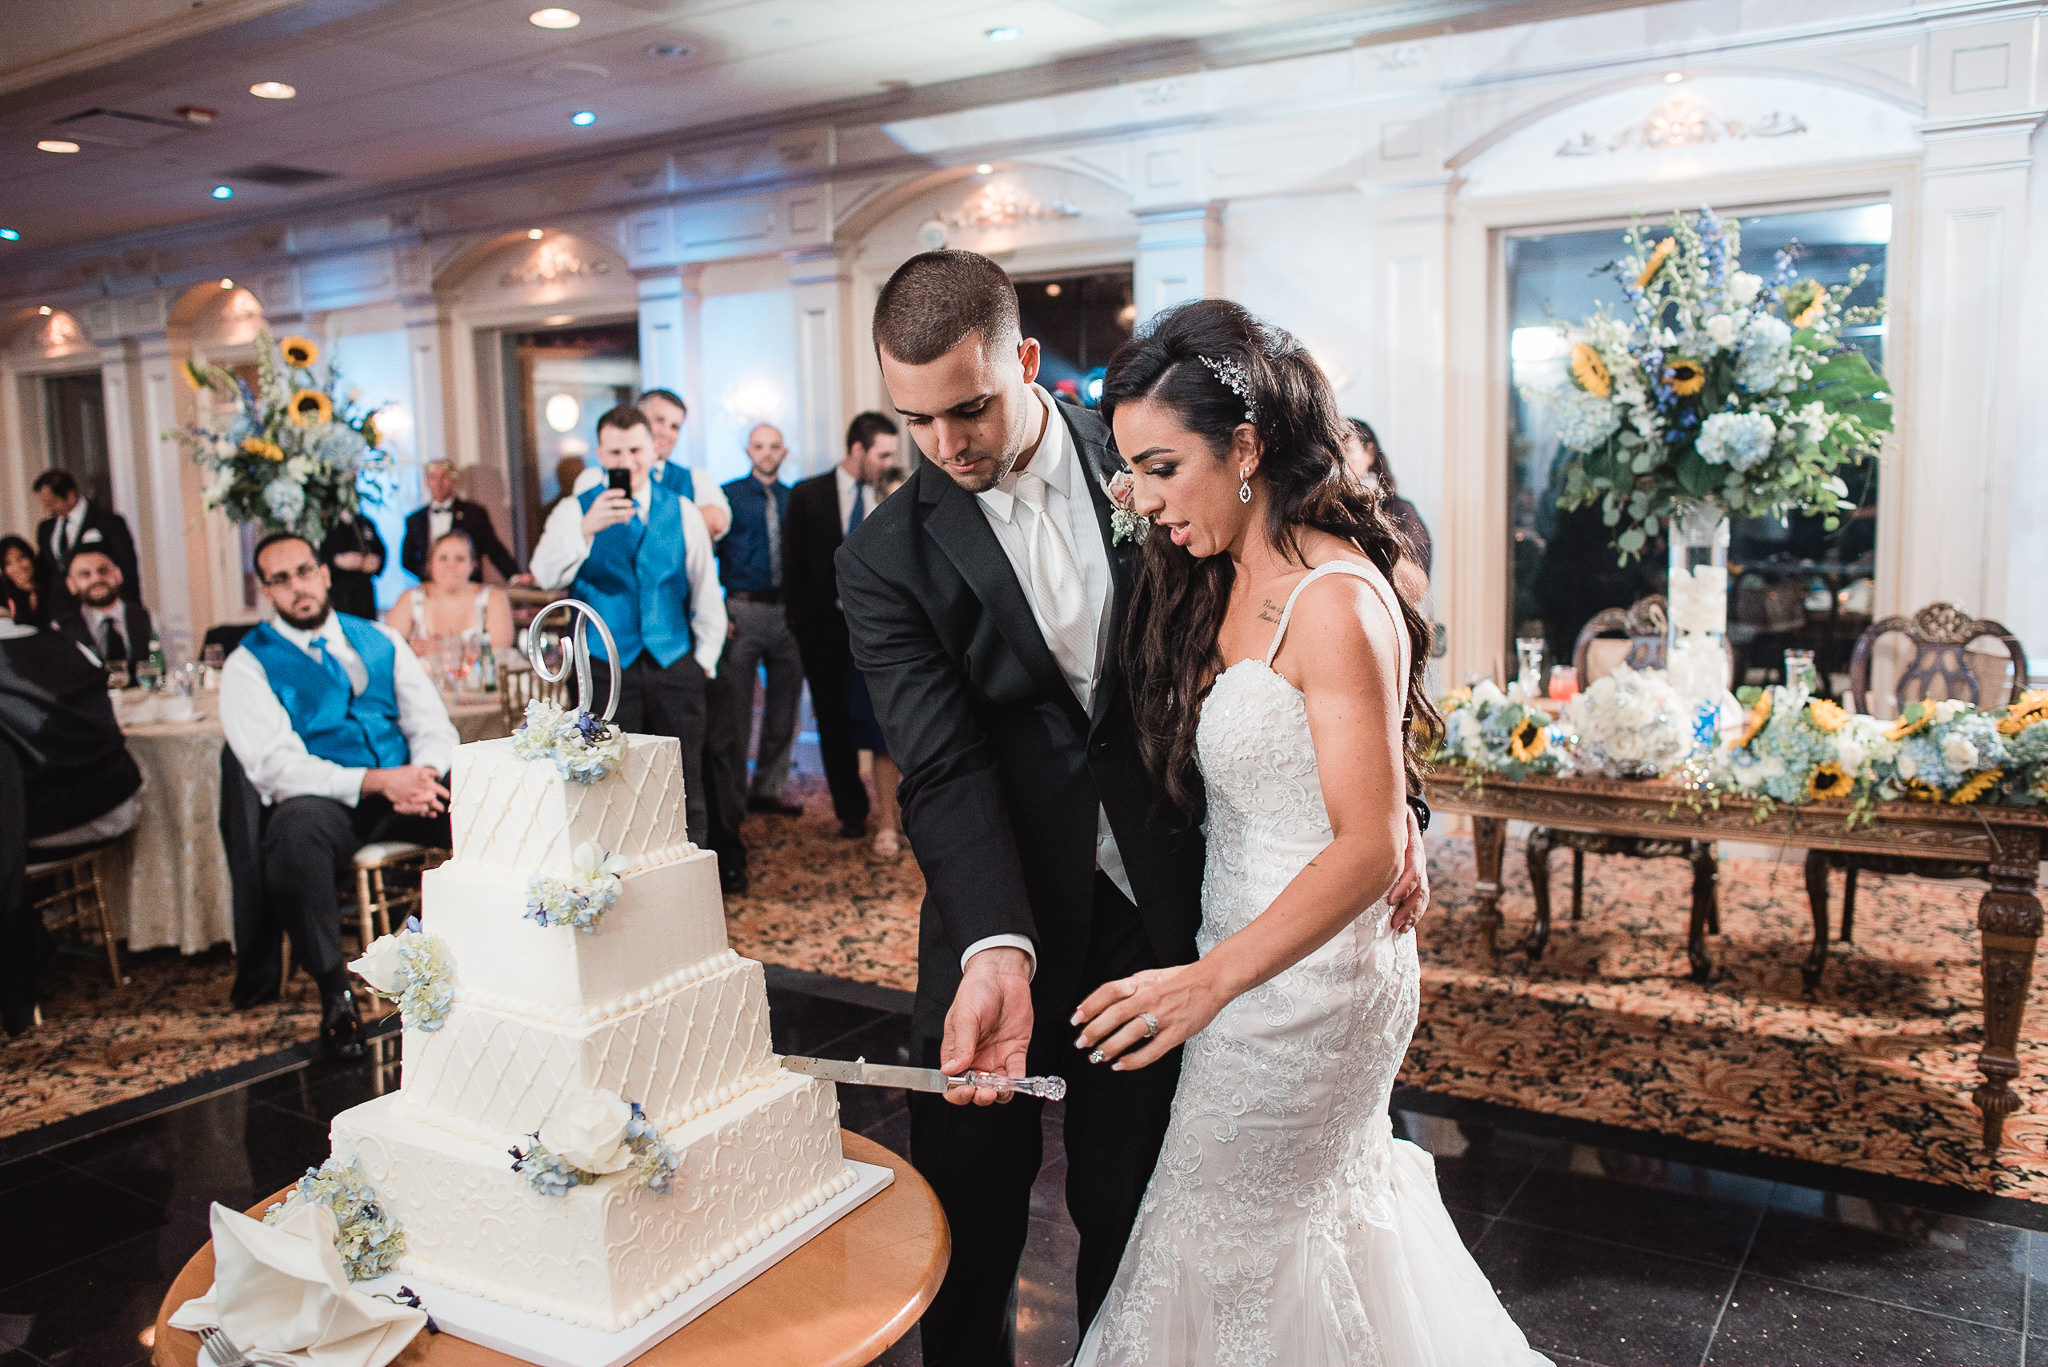 NN_ILTULIPANO_WEDDING_NEW_JERSEY_3901.jpg